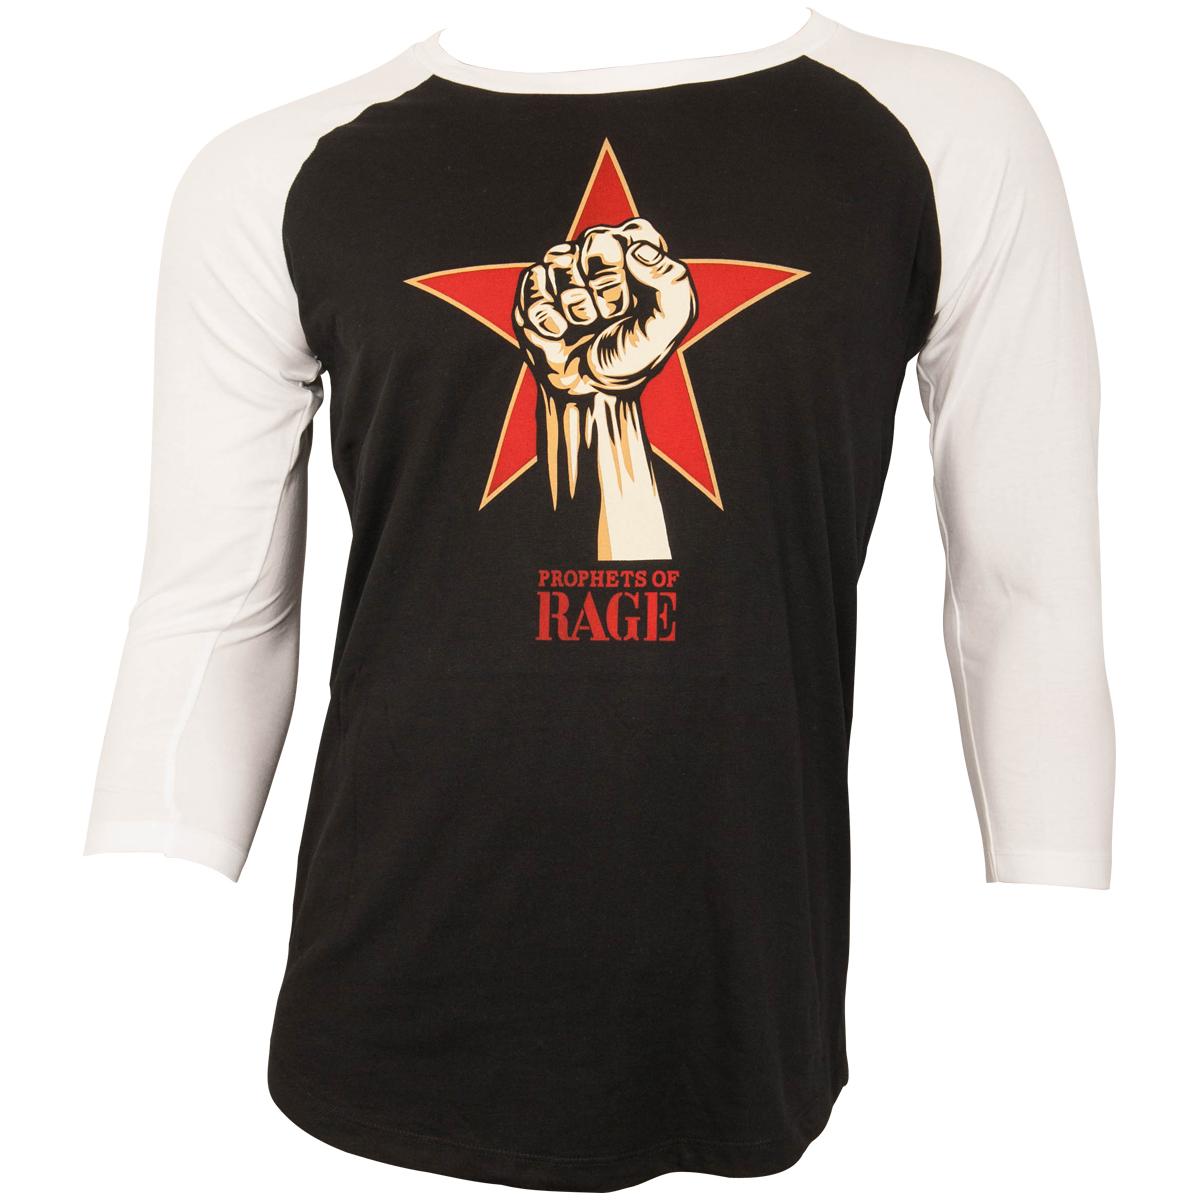 Prophets of Rage - Baseball Shirt Power Fist - schwarz